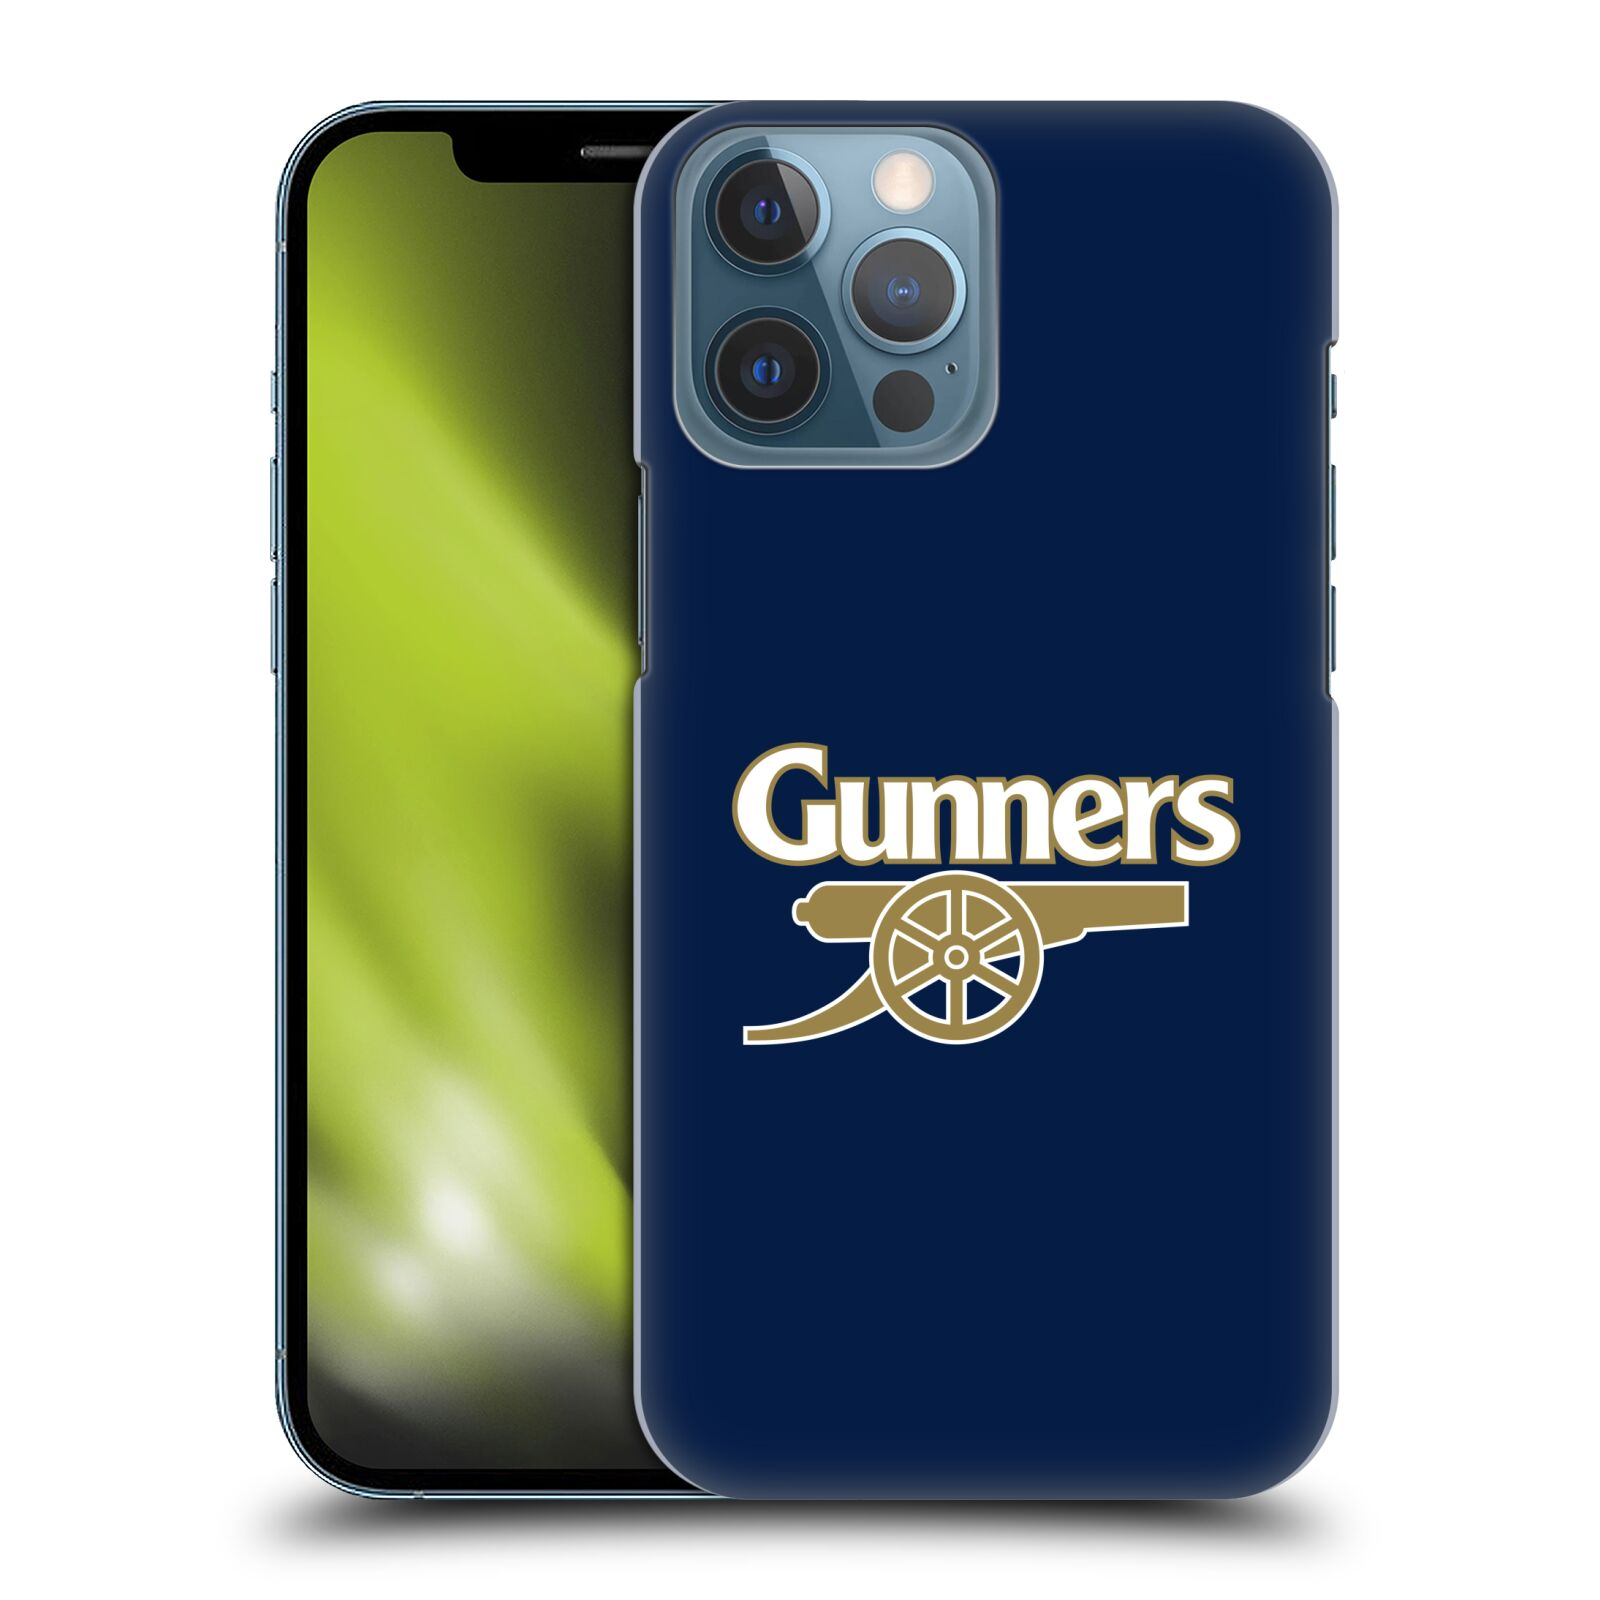 Plastové pouzdro na mobil Apple iPhone 13 Pro Max - Head Case - Arsenal FC - Gunners